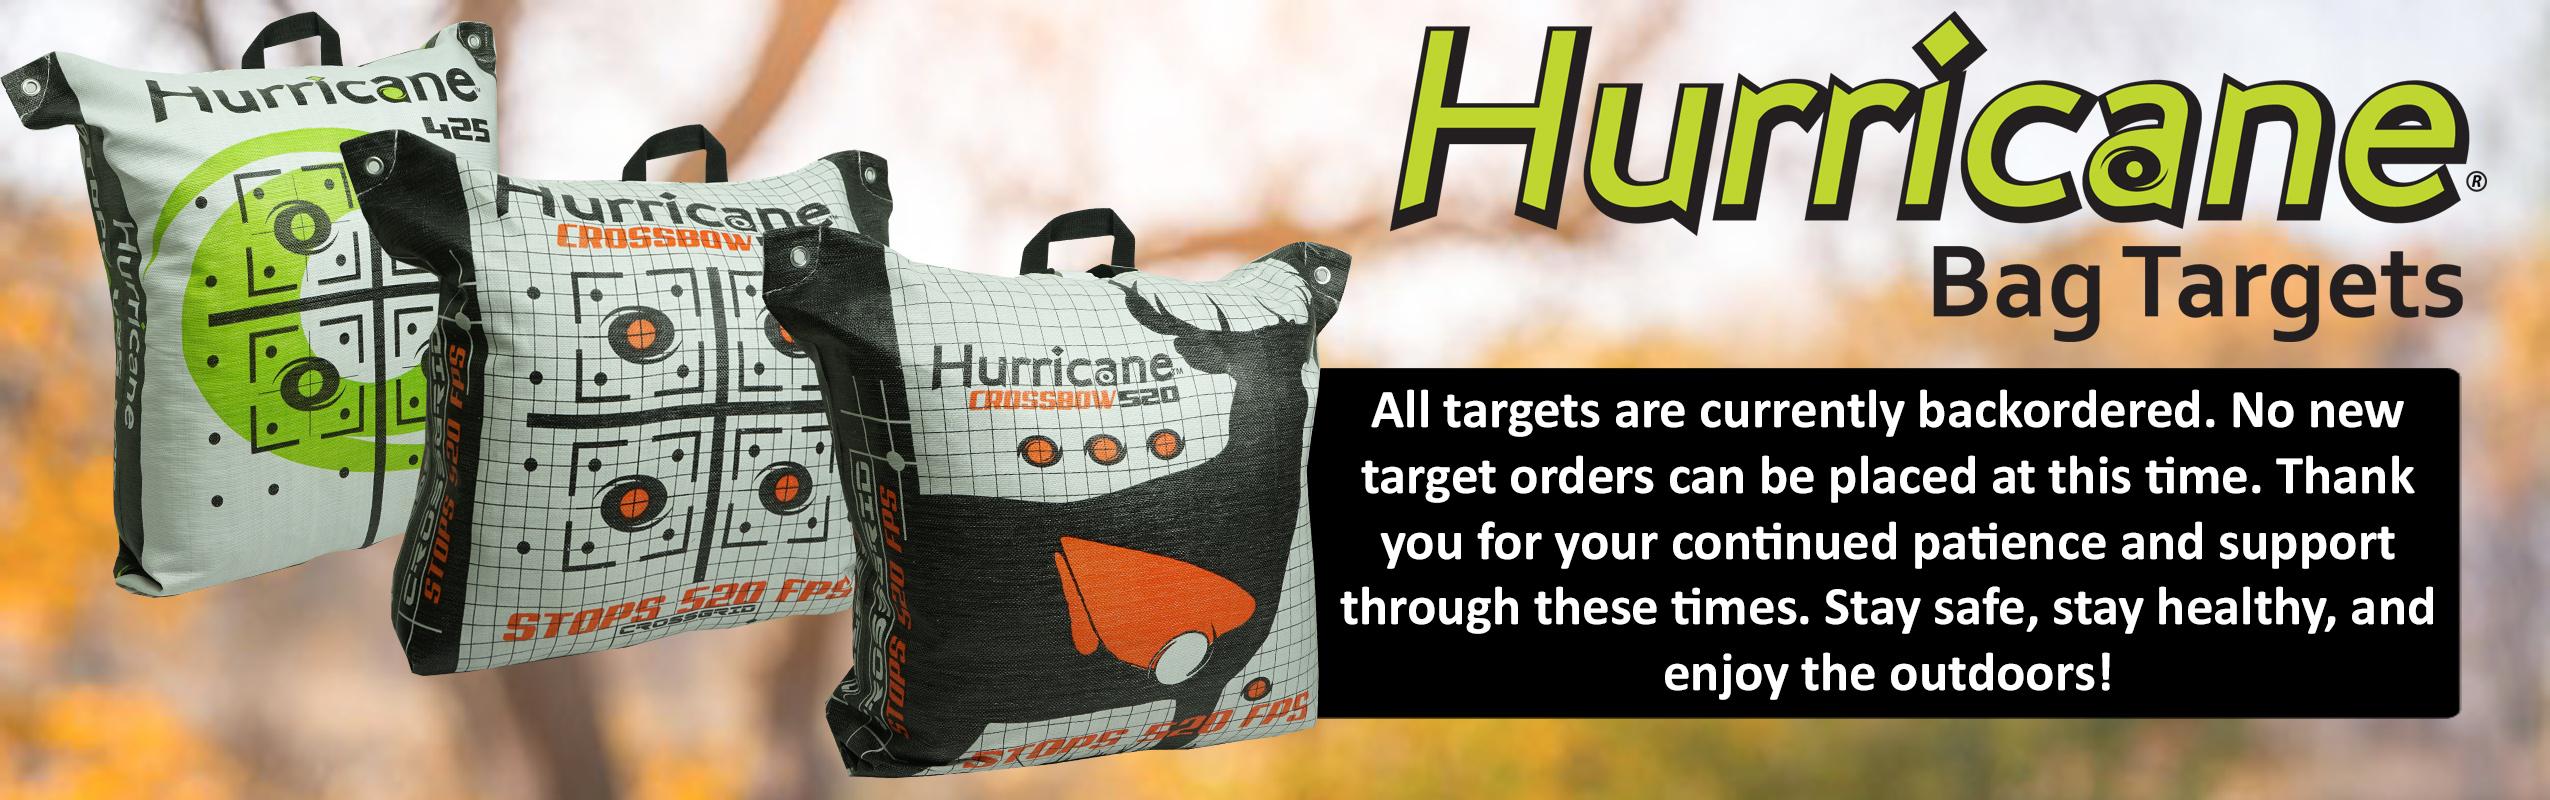 Hurricane Bag Targets